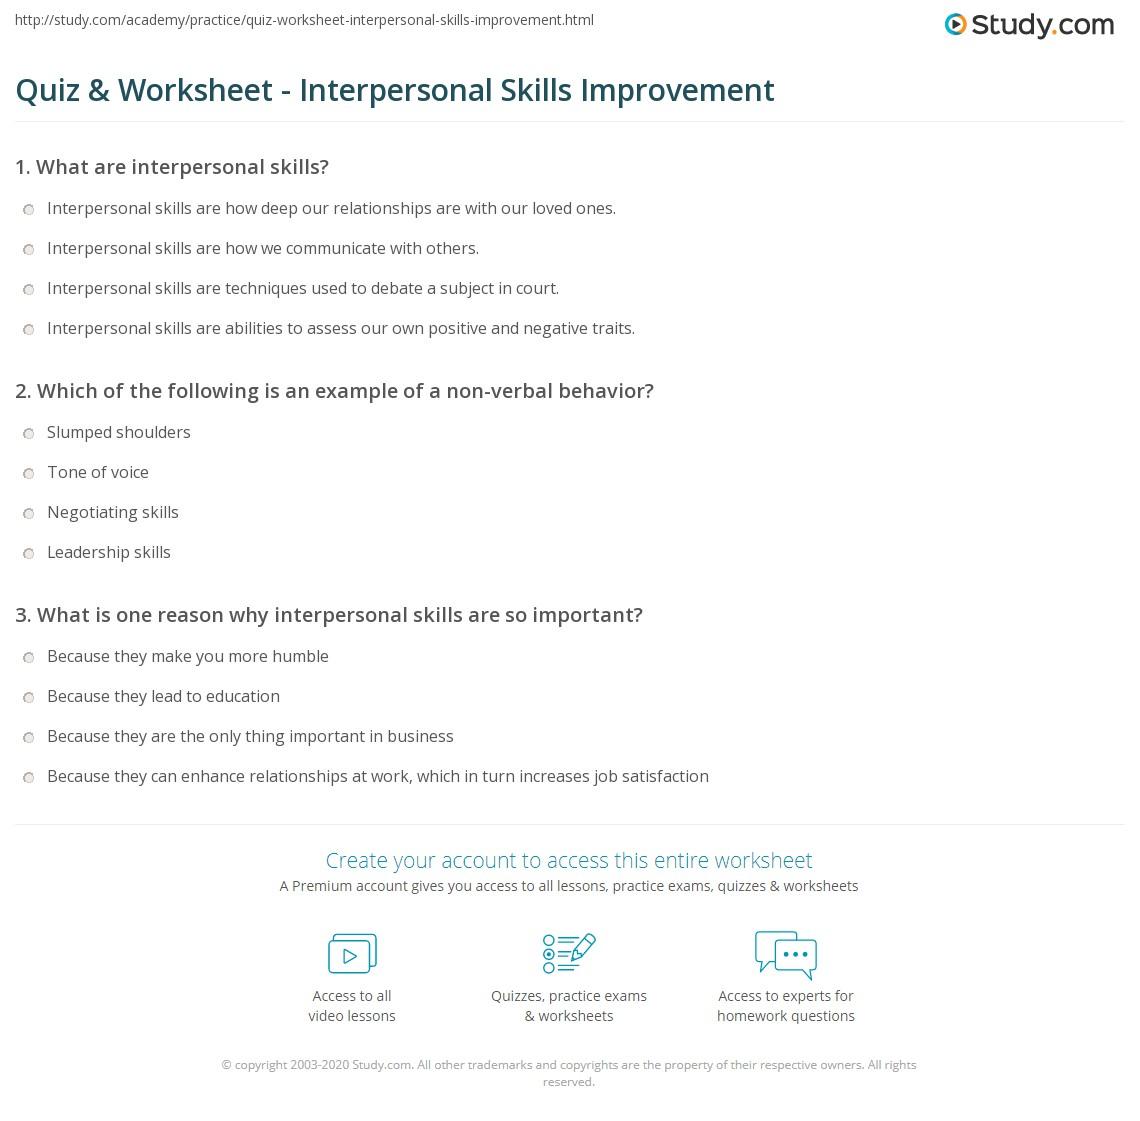 quiz worksheet interpersonal skills improvement com print how to improve interpersonal skills worksheet